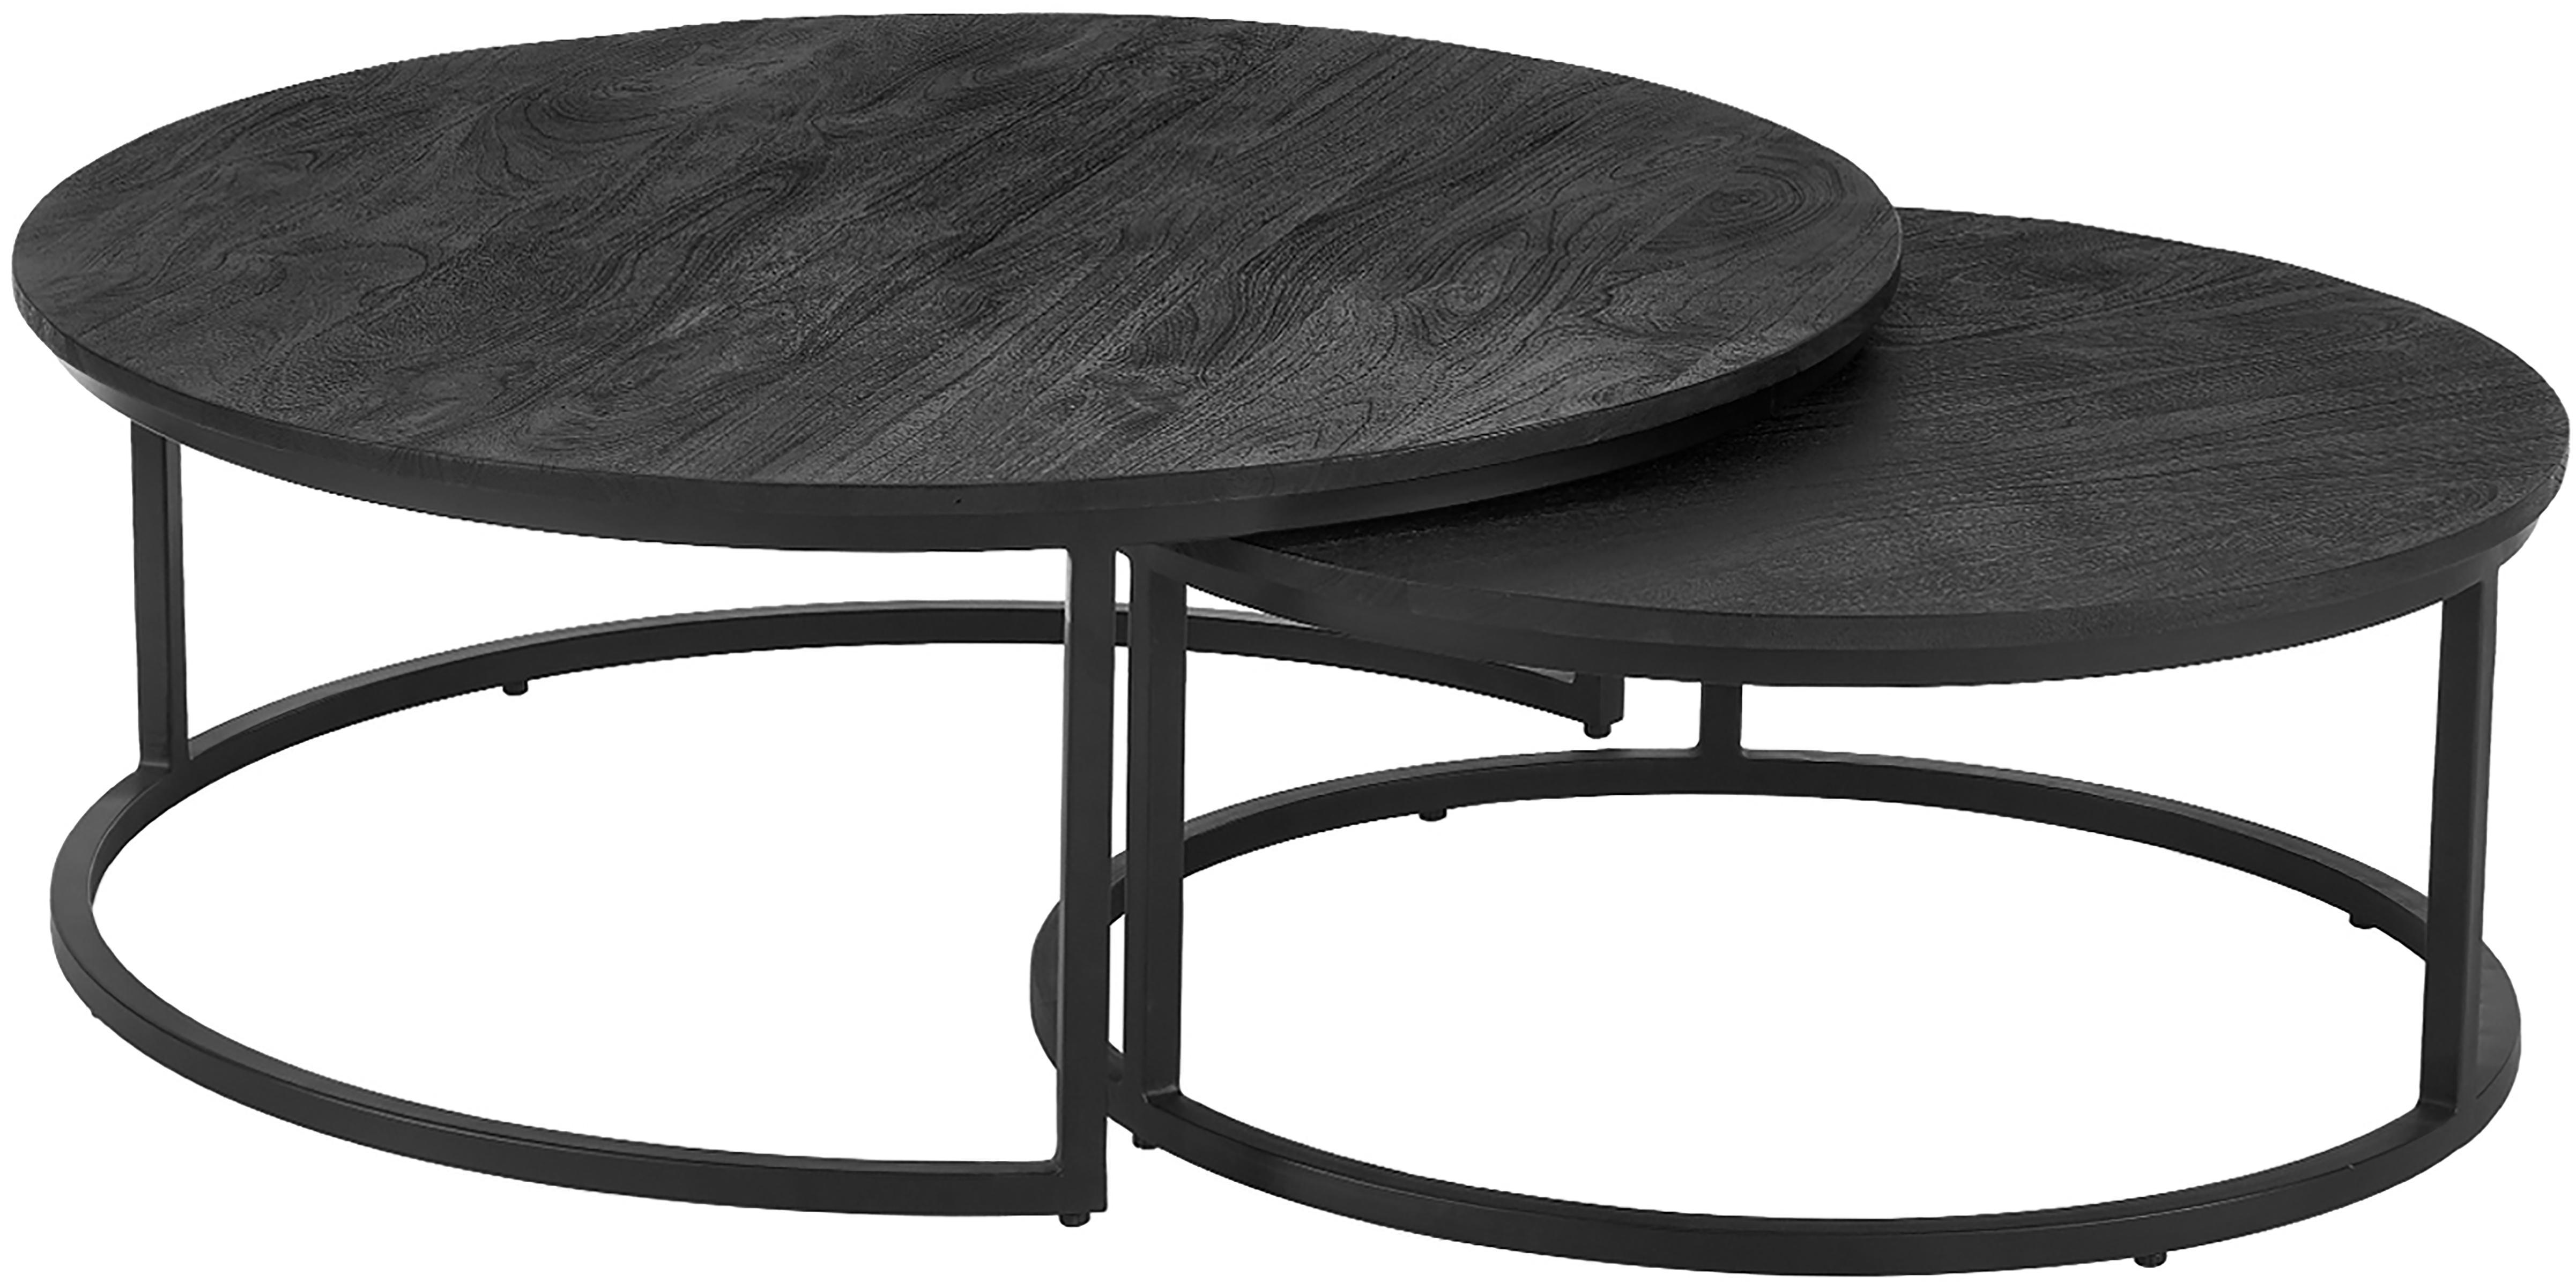 Couchtisch 2er-Set Andrew aus schwarzem Mangoholz, Tischplatten: Mangoholz, schwarz lackiertGestelle: Schwarz, matt, Sondergrößen